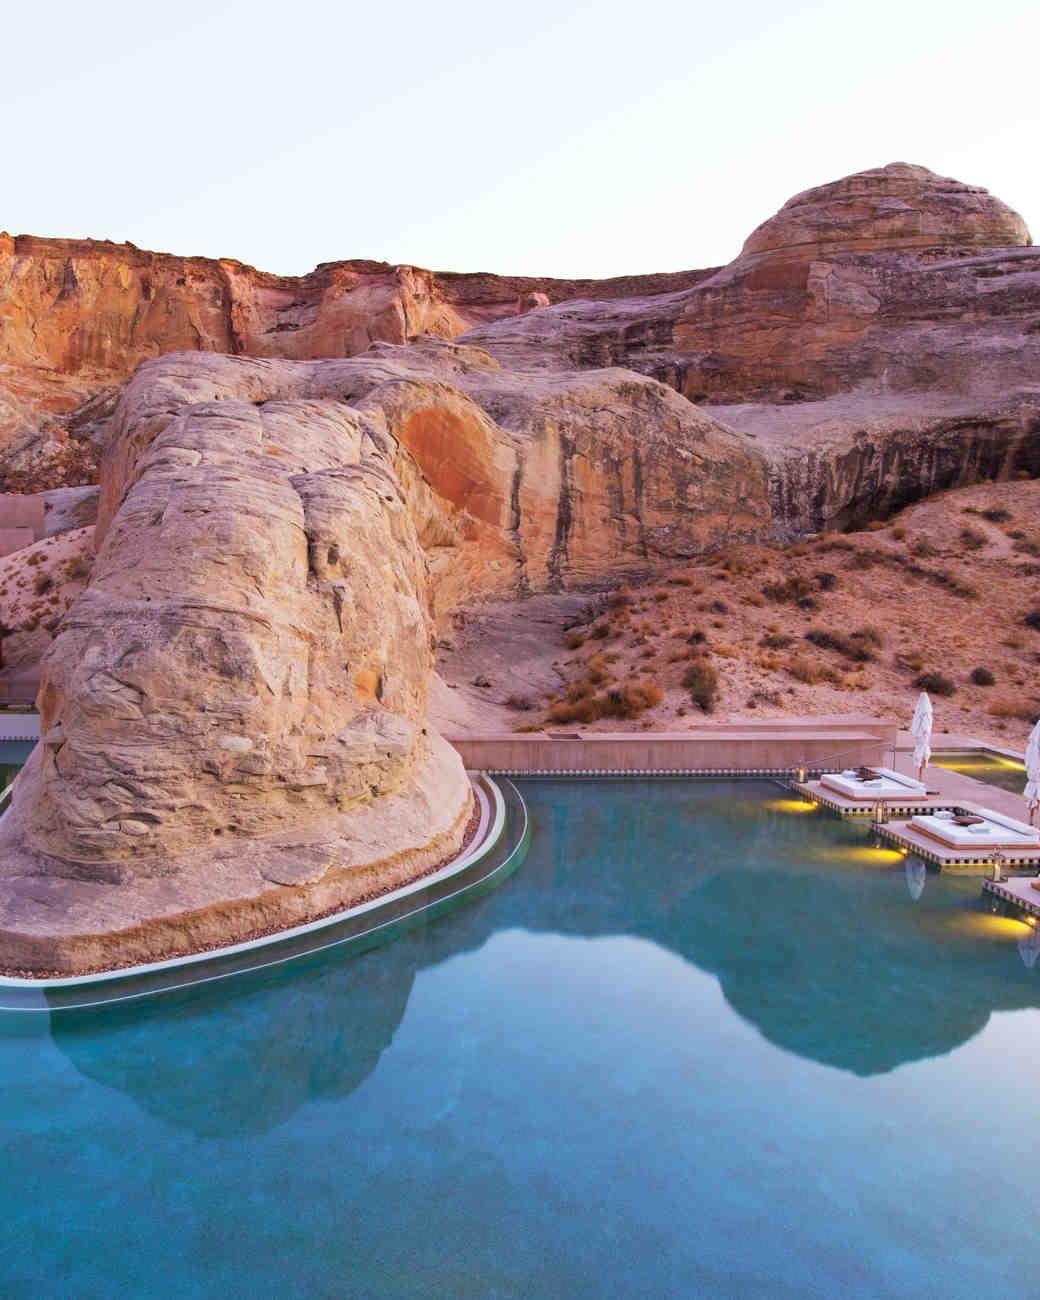 red-rock-rs992-amangiri--swimming-pool-dusk-mwds111006.jpg